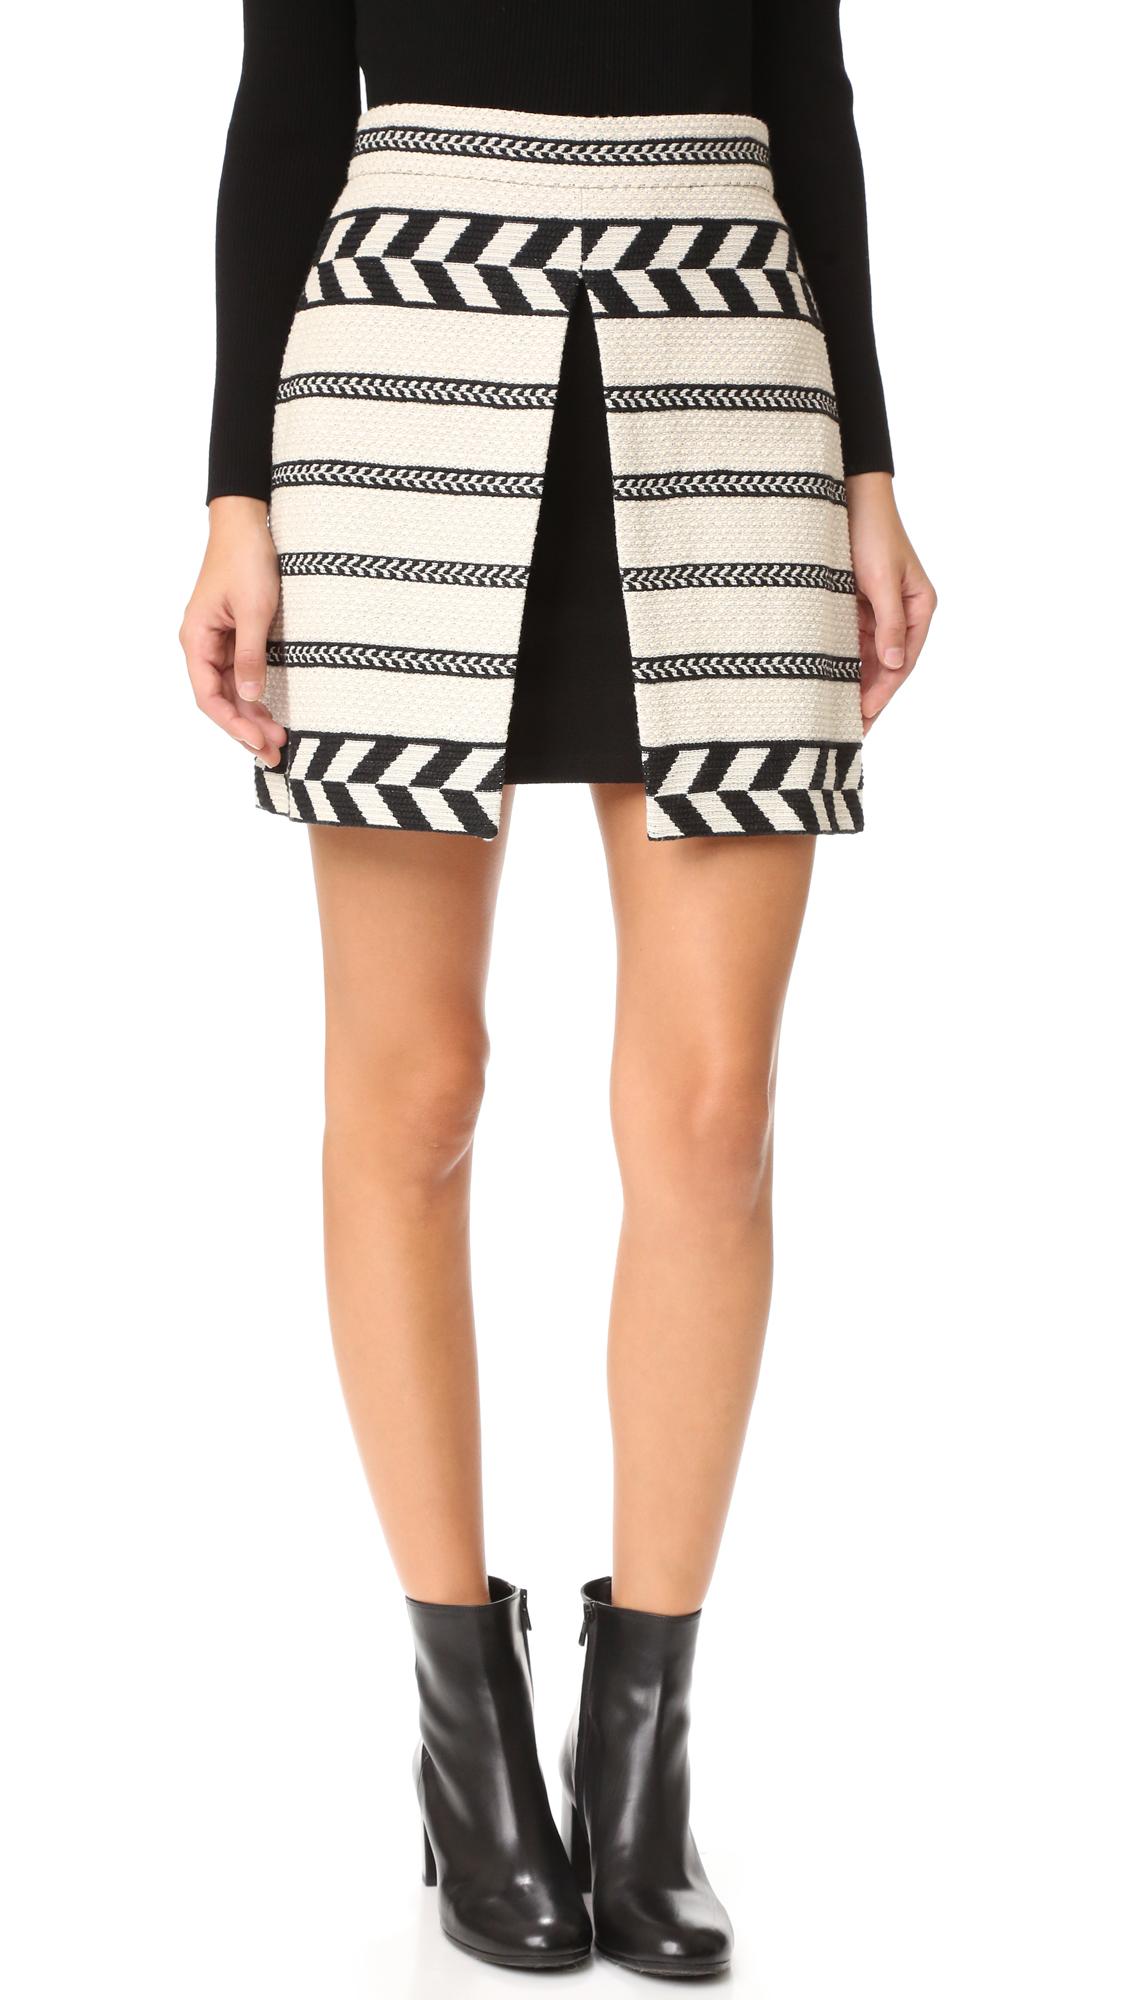 Alice + Olivia Daysi Mini Front Slit Skirt - Cream/Black at Shopbop